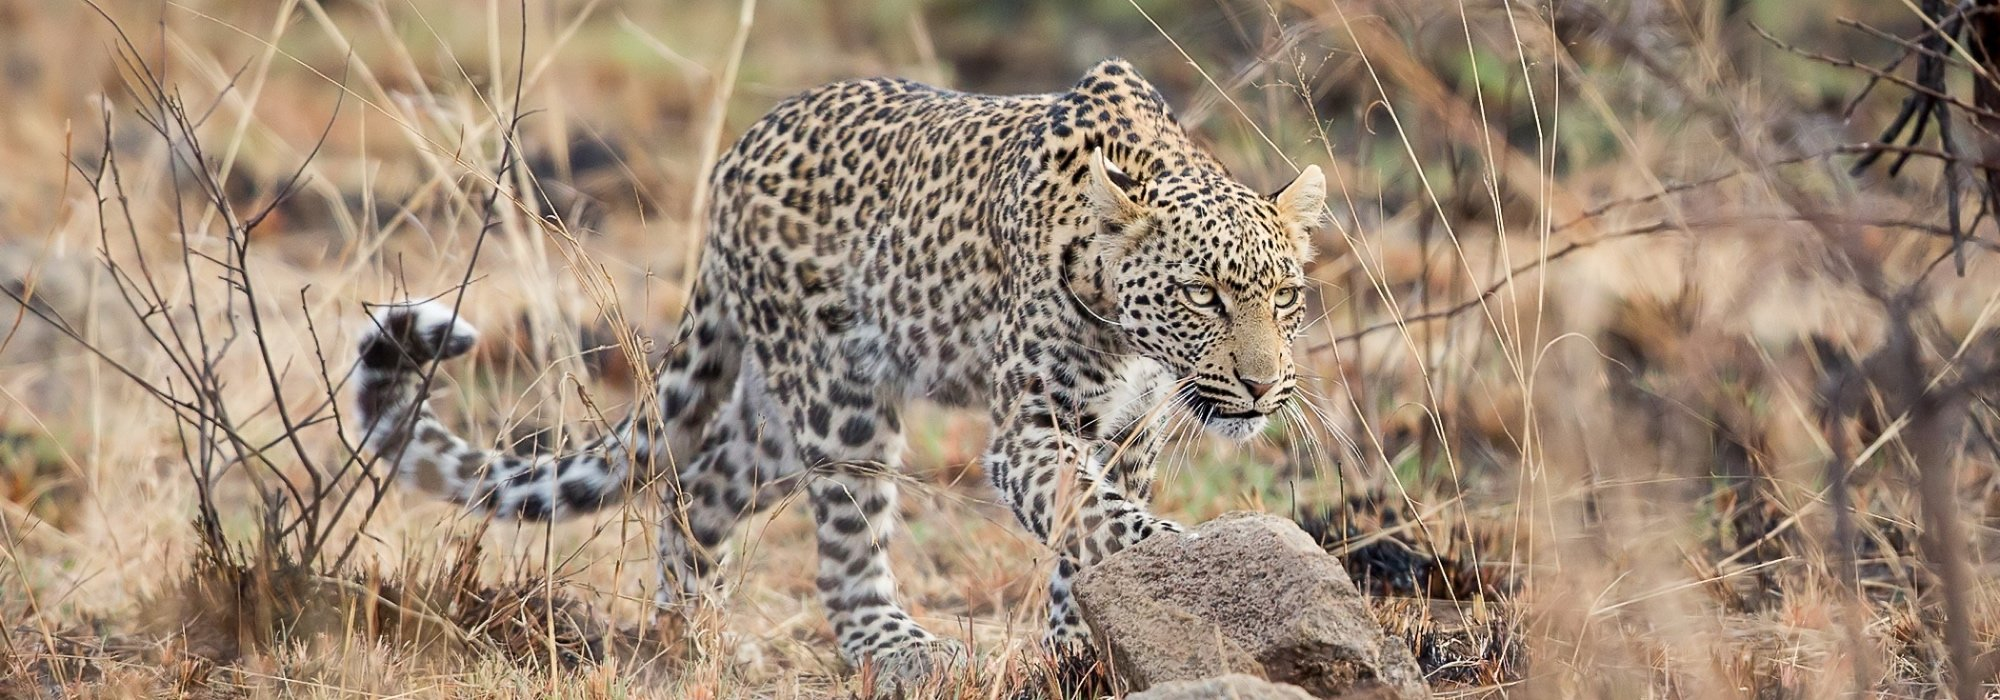 Leopared on safari in Pilanesberg